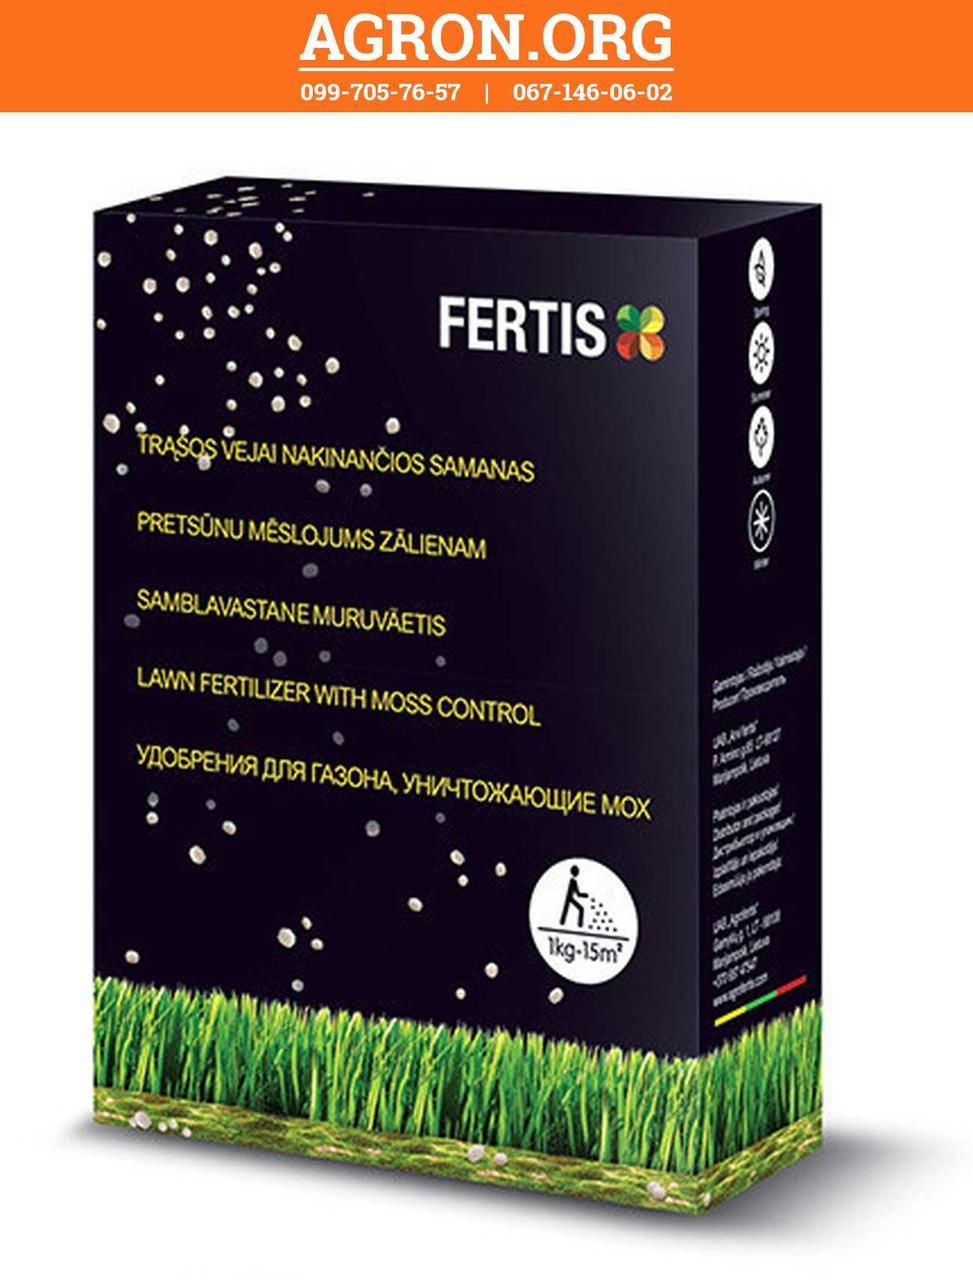 Фертіс (Fertis) NPK 15-0-0+Fe удобрение для газону Binfield 5 кг